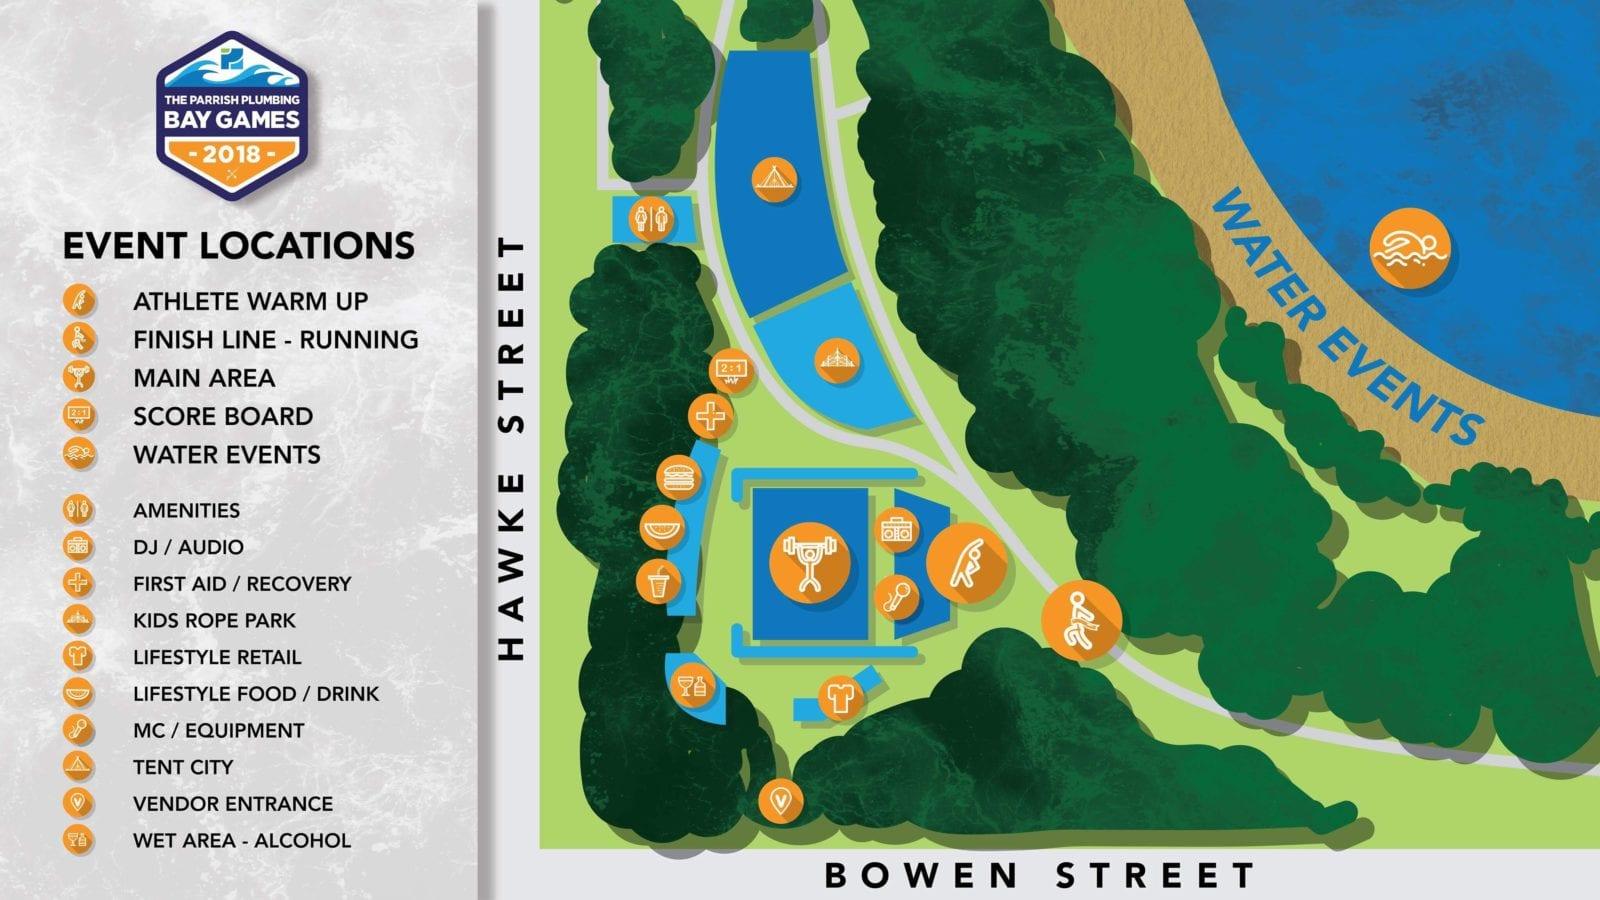 bay games map